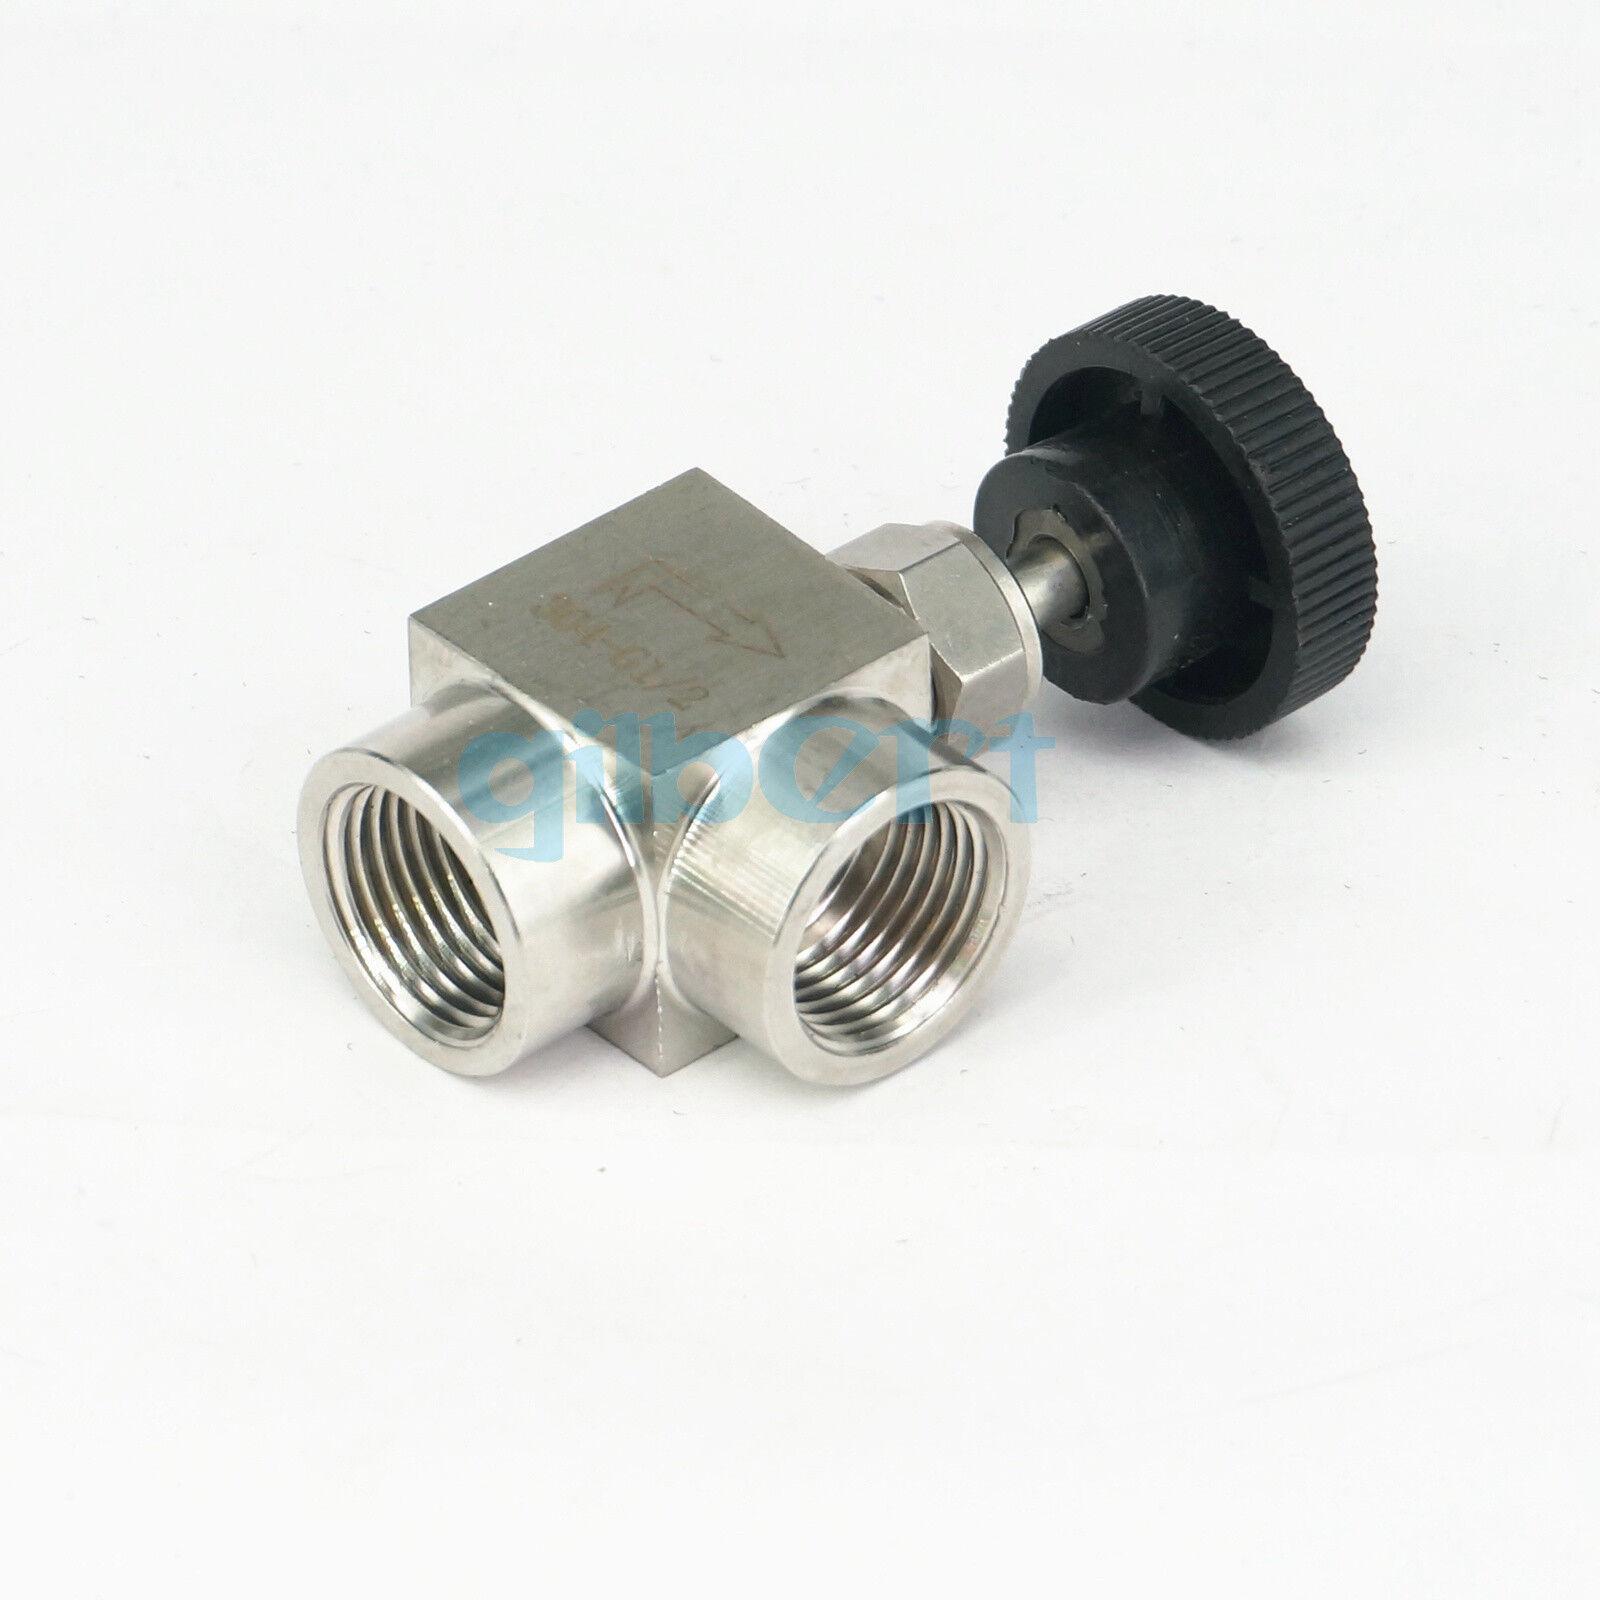 YINGJUN Valves 1//2 inch BSP Equal Female Thread 304 Stainless Steel Flow Control Shut Off Needle Valve